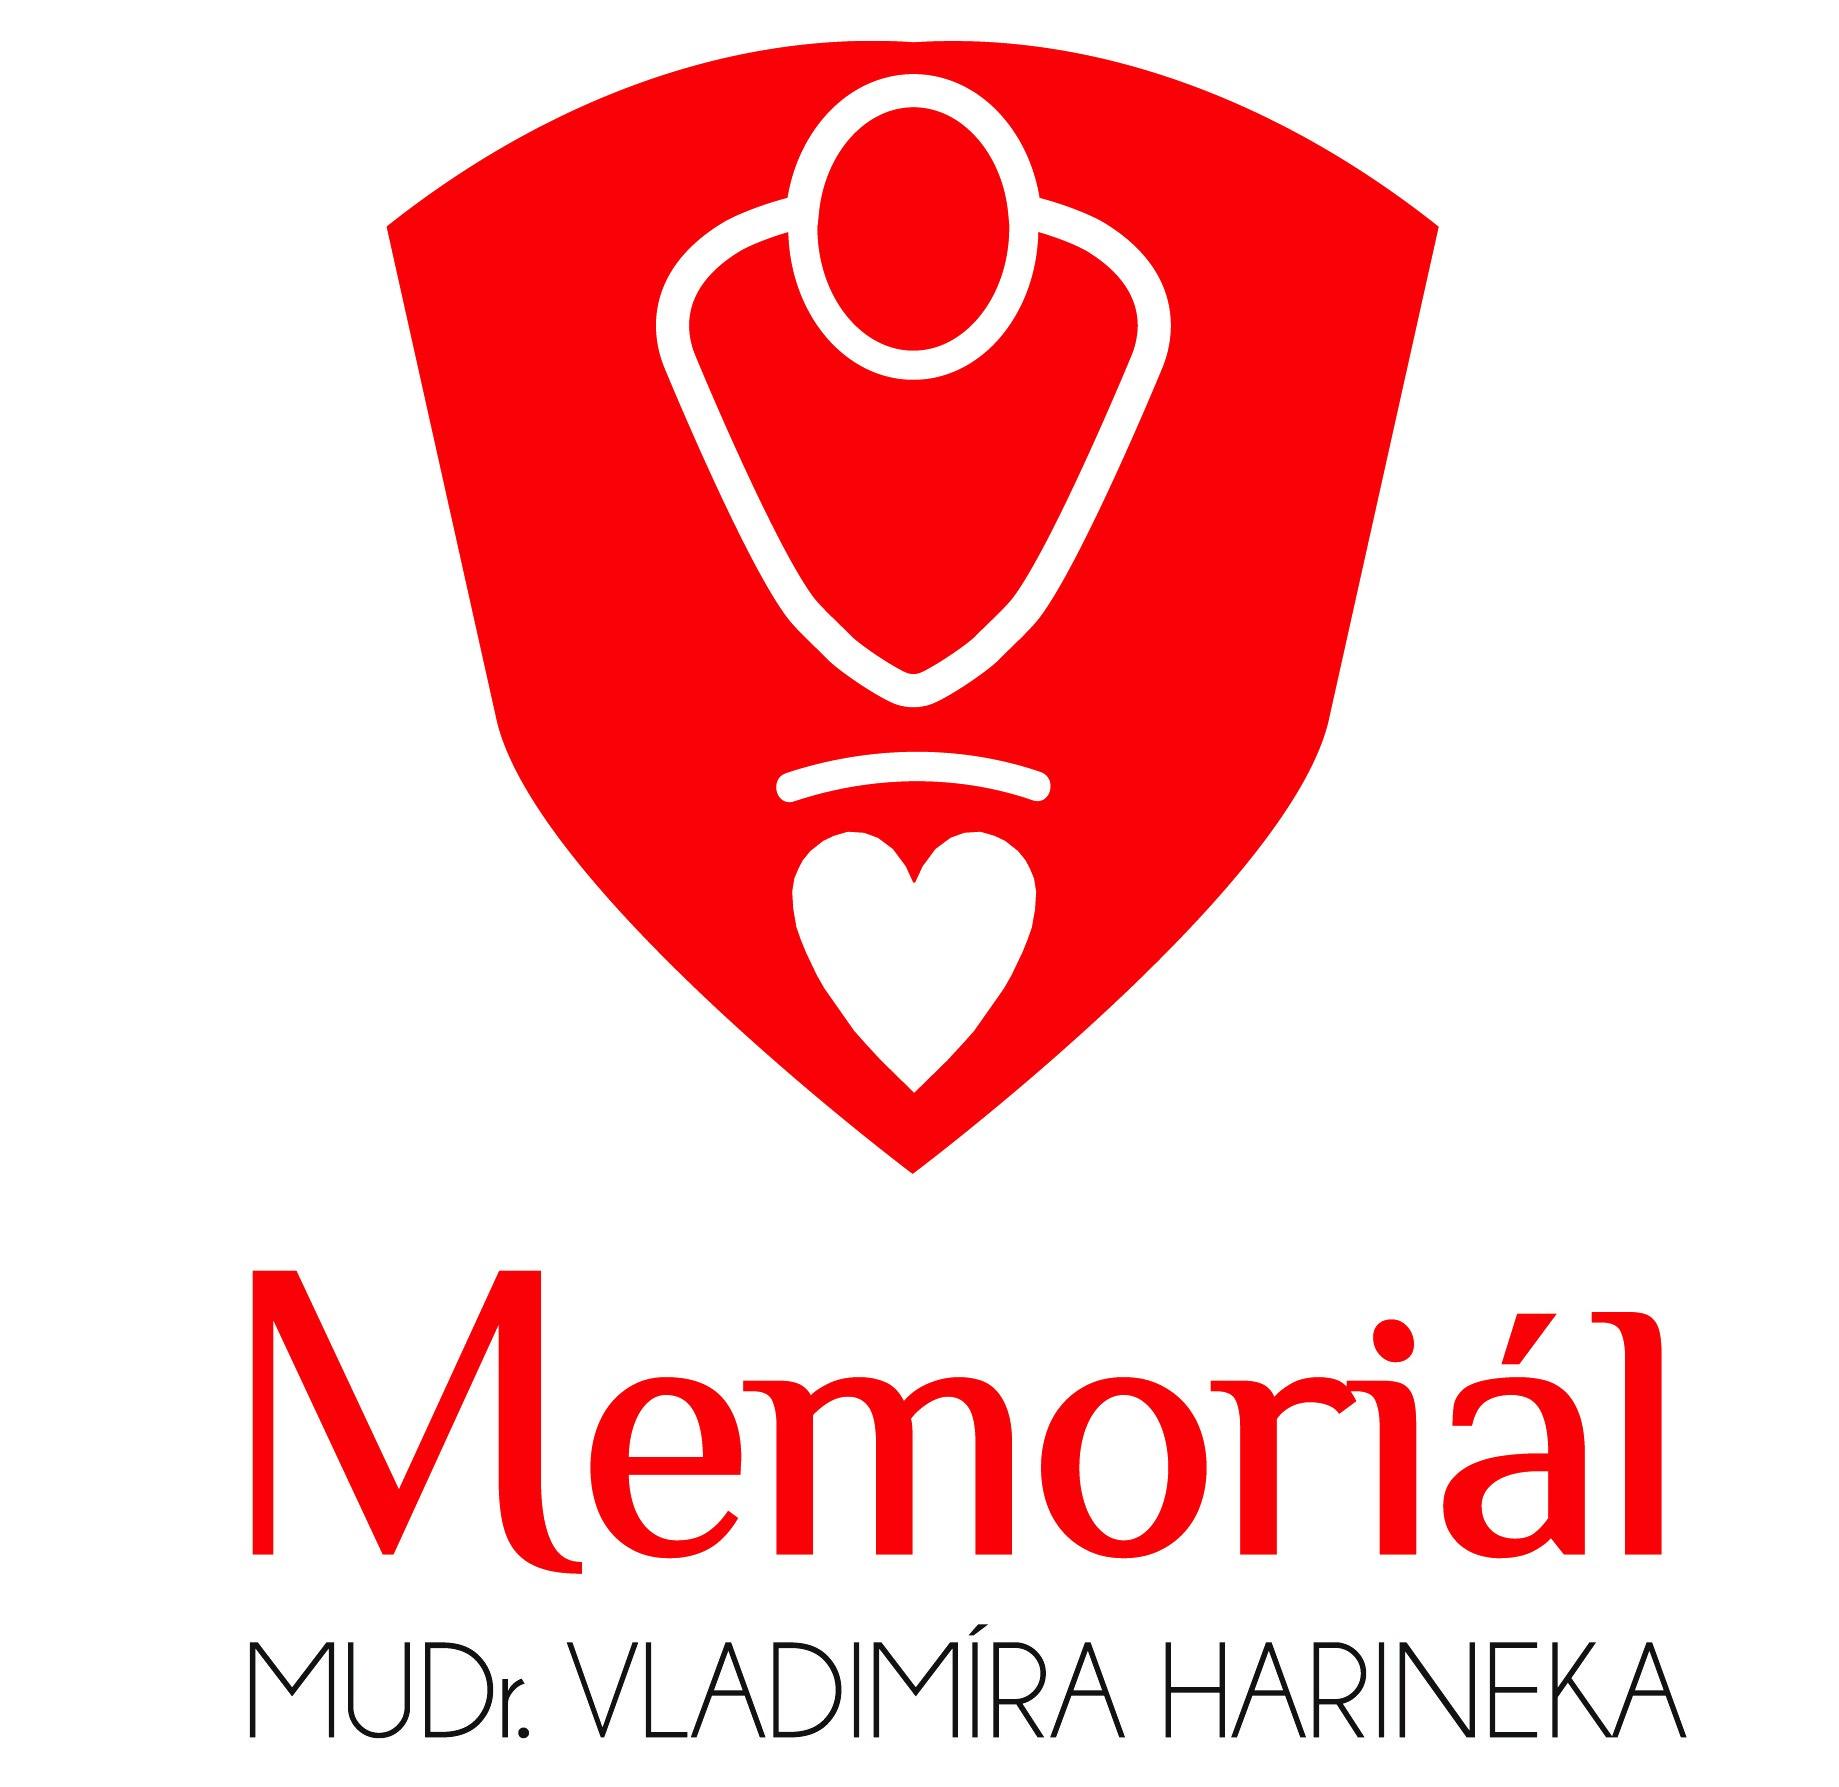 Memoriál MUDr. Vladimíra Harineka 2018